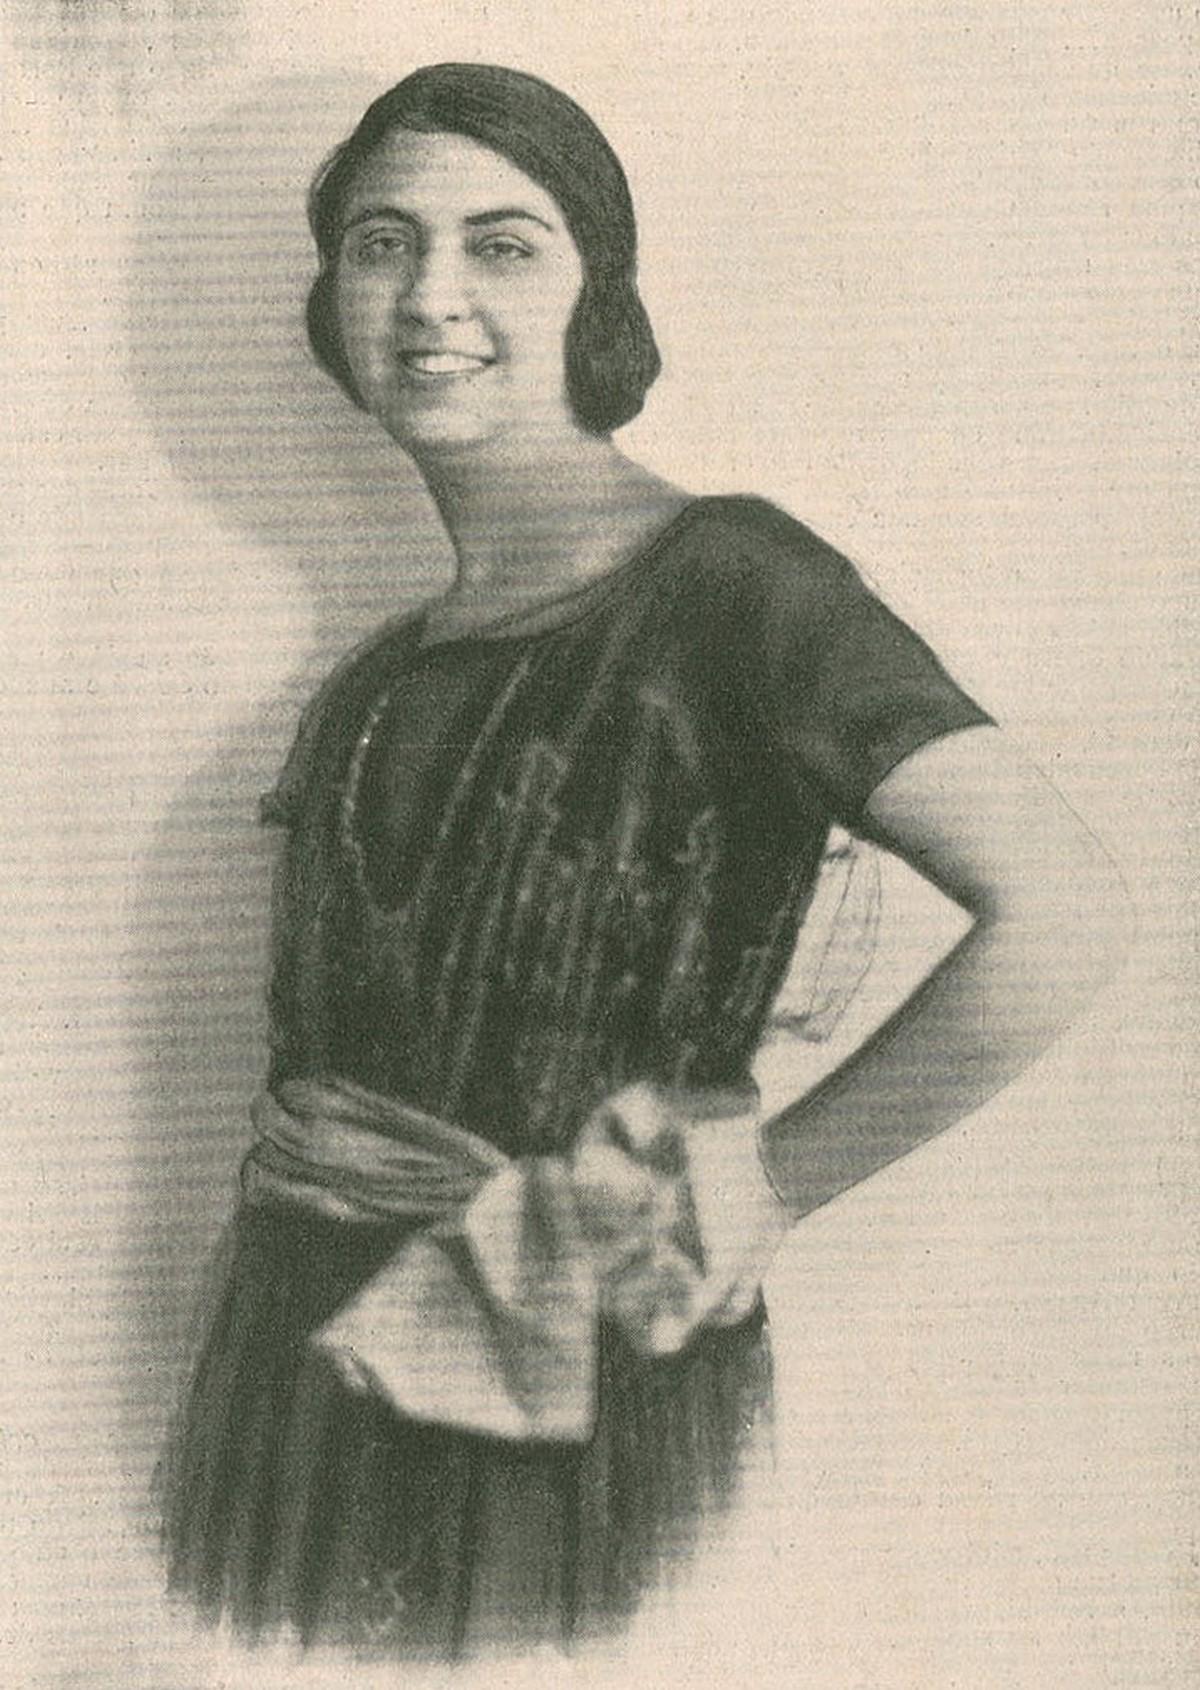 Retrato da escritora portuguesa Fernanda de Castro nos anos 20.